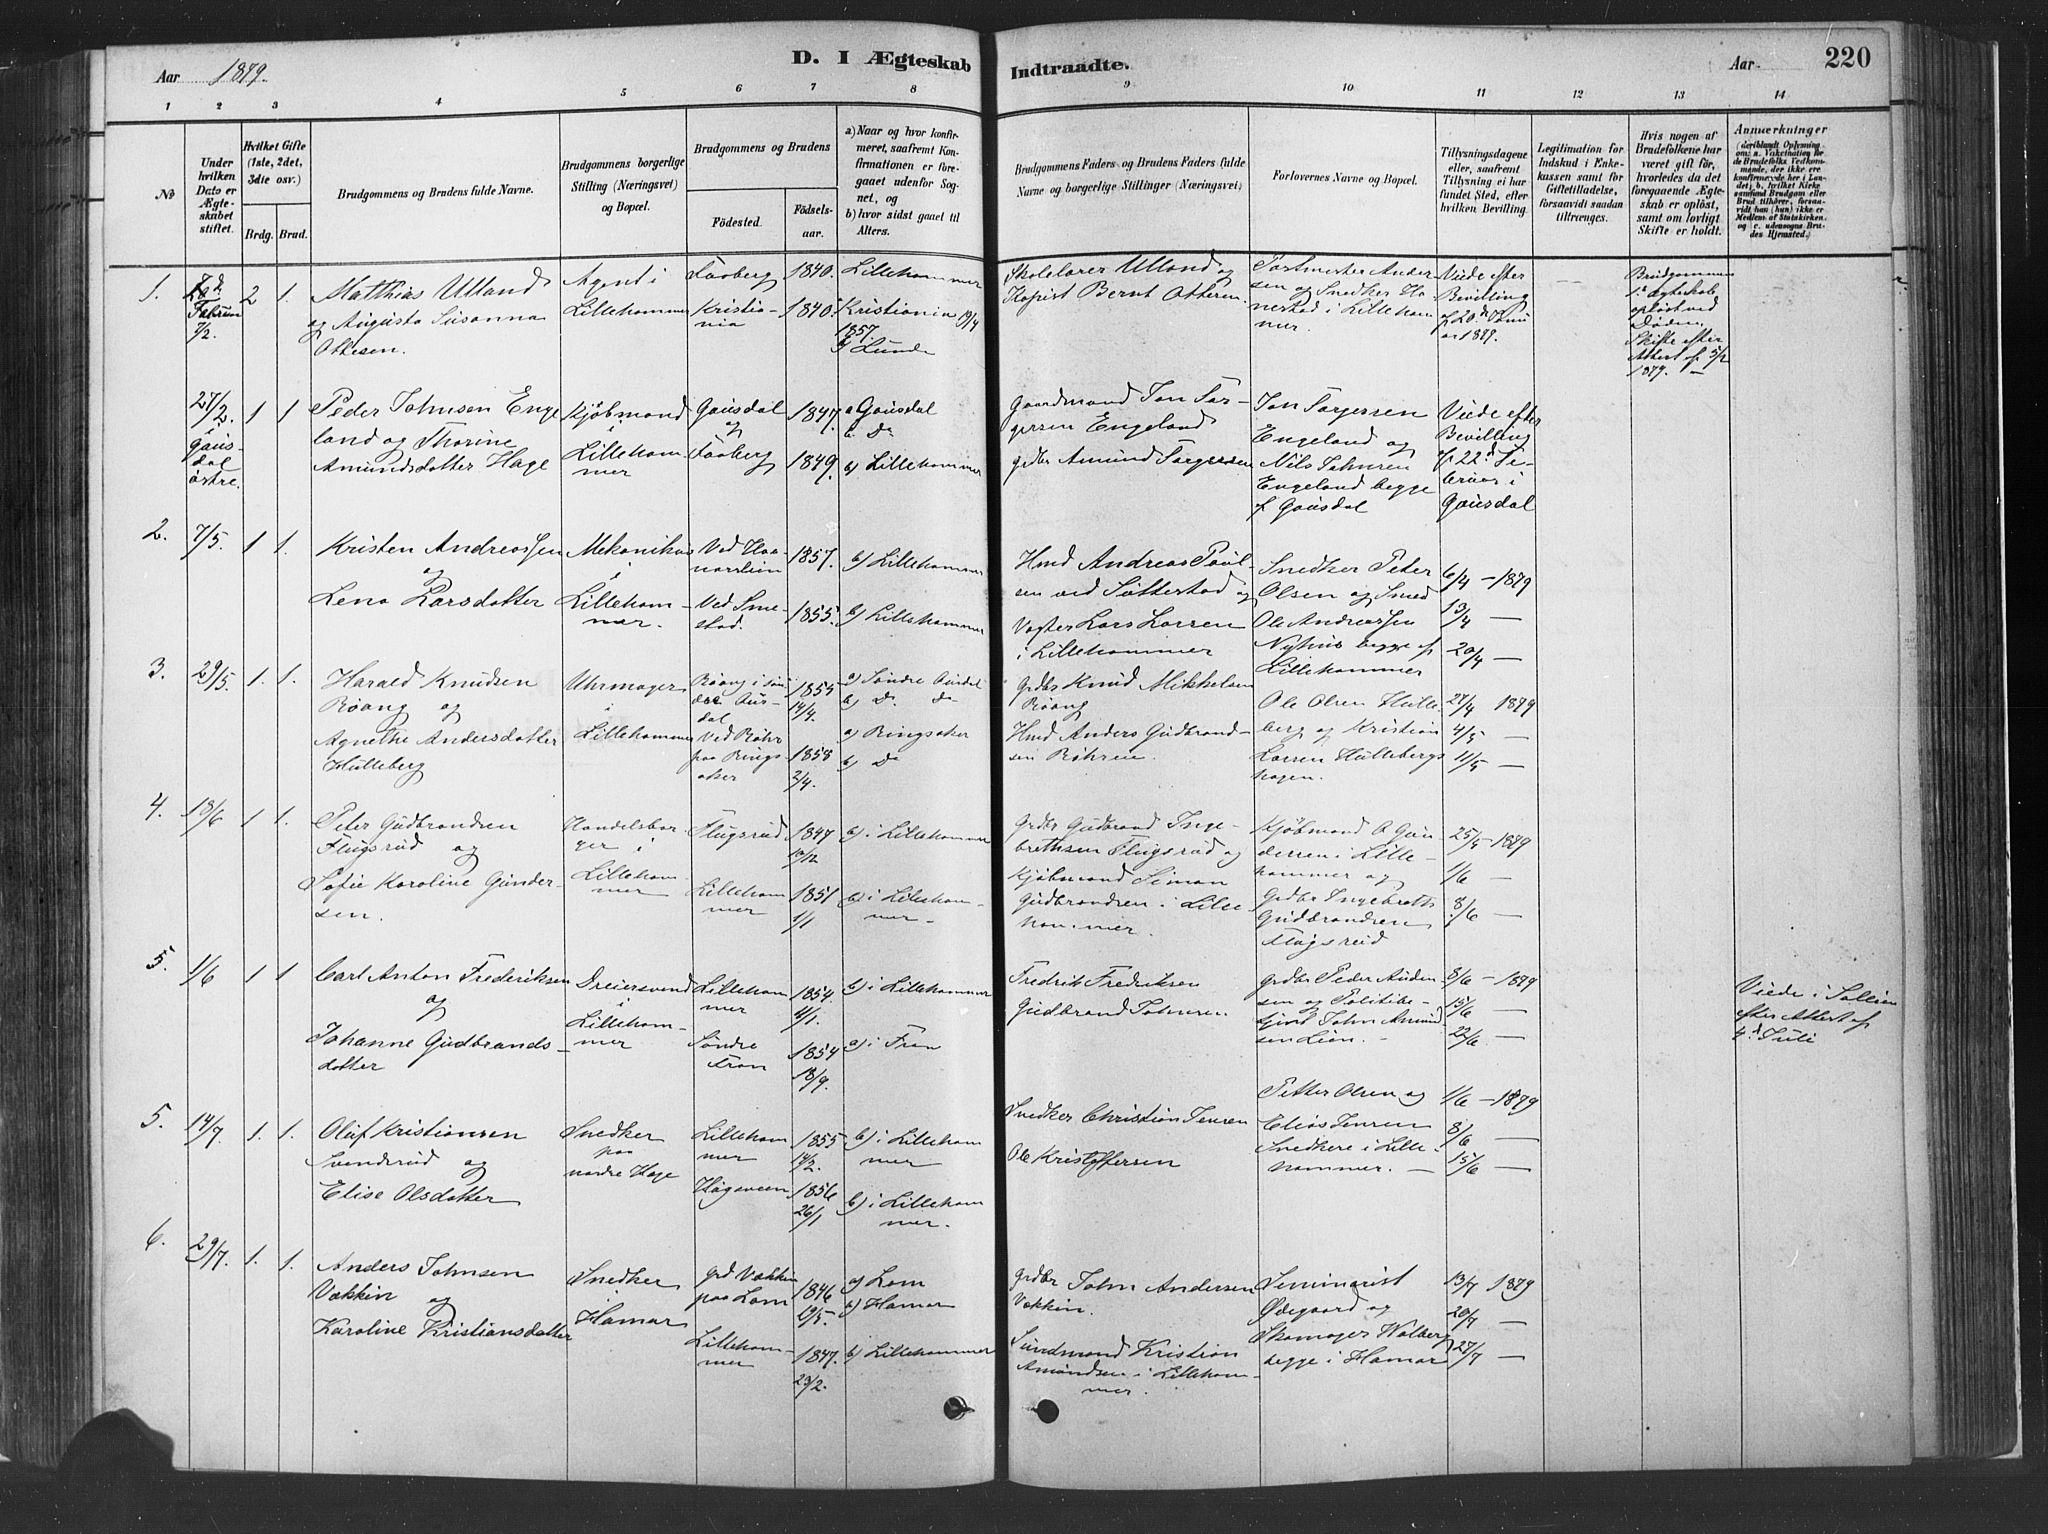 SAH, Fåberg prestekontor, Ministerialbok nr. 10, 1879-1900, s. 220